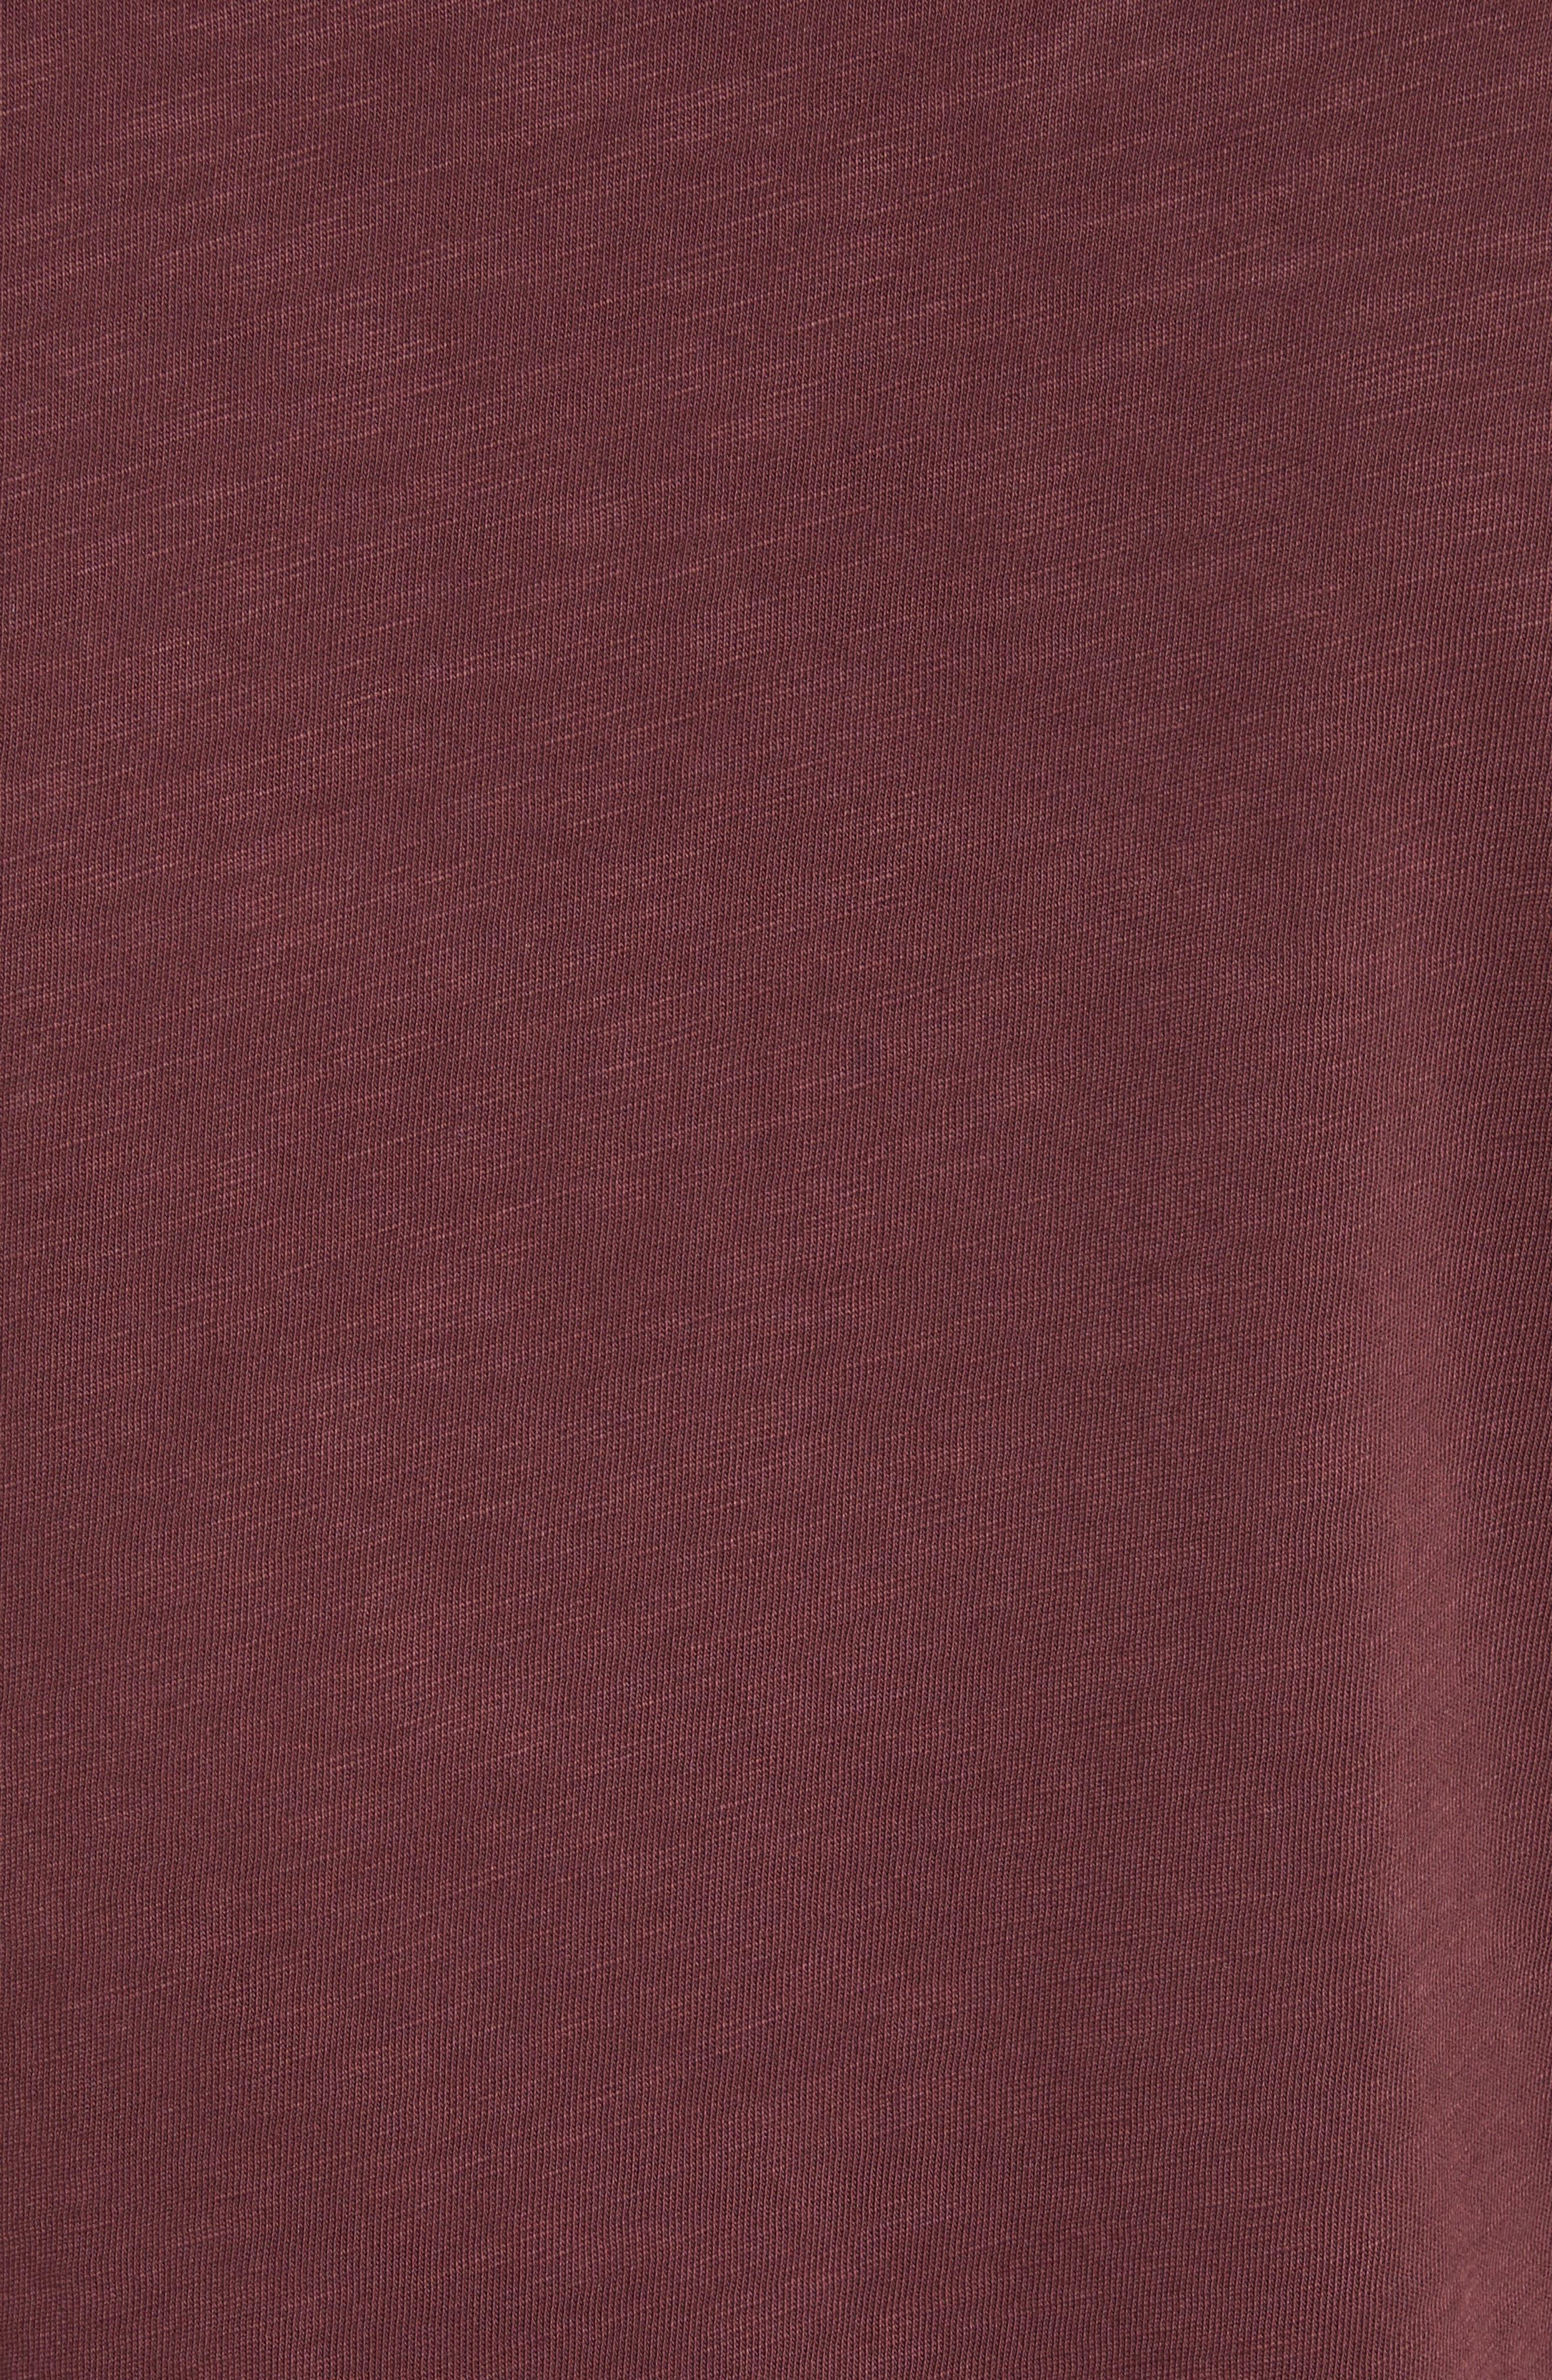 Alternate Image 5  - rag & bone Standard Issue Slub Jersey Polo